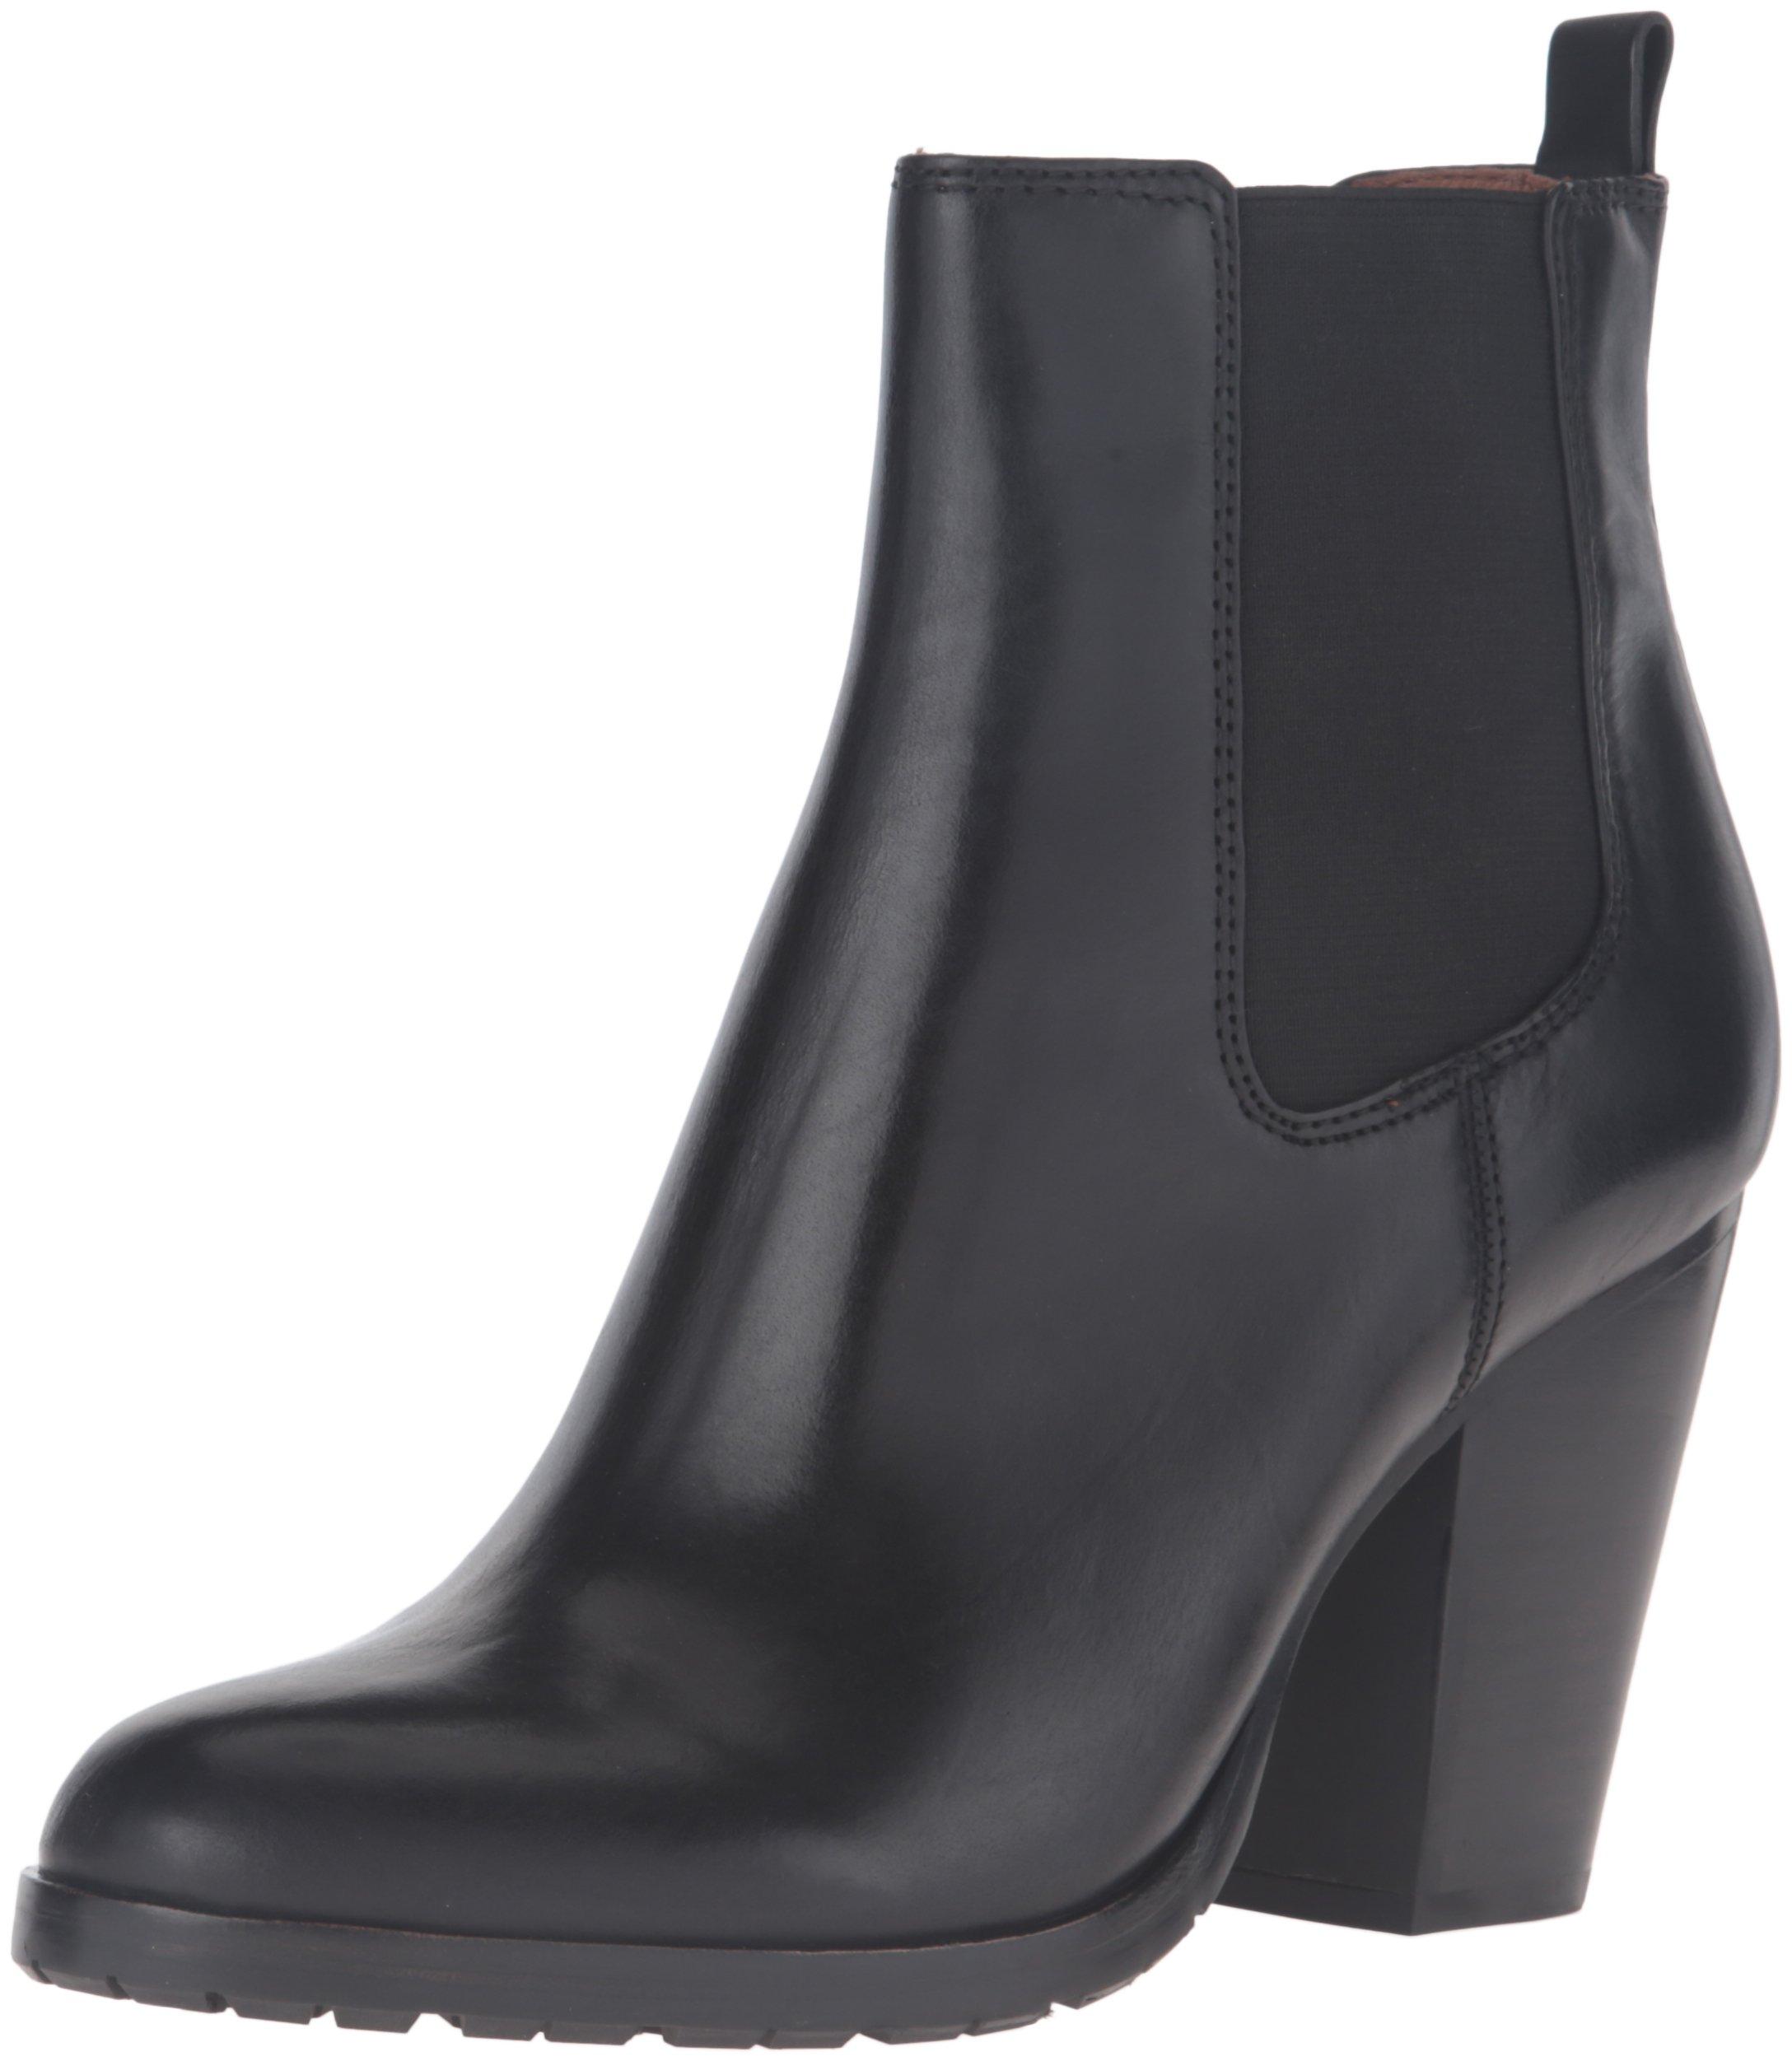 FRYE Women's Tate Chelsea Boot, Black, 8 M US